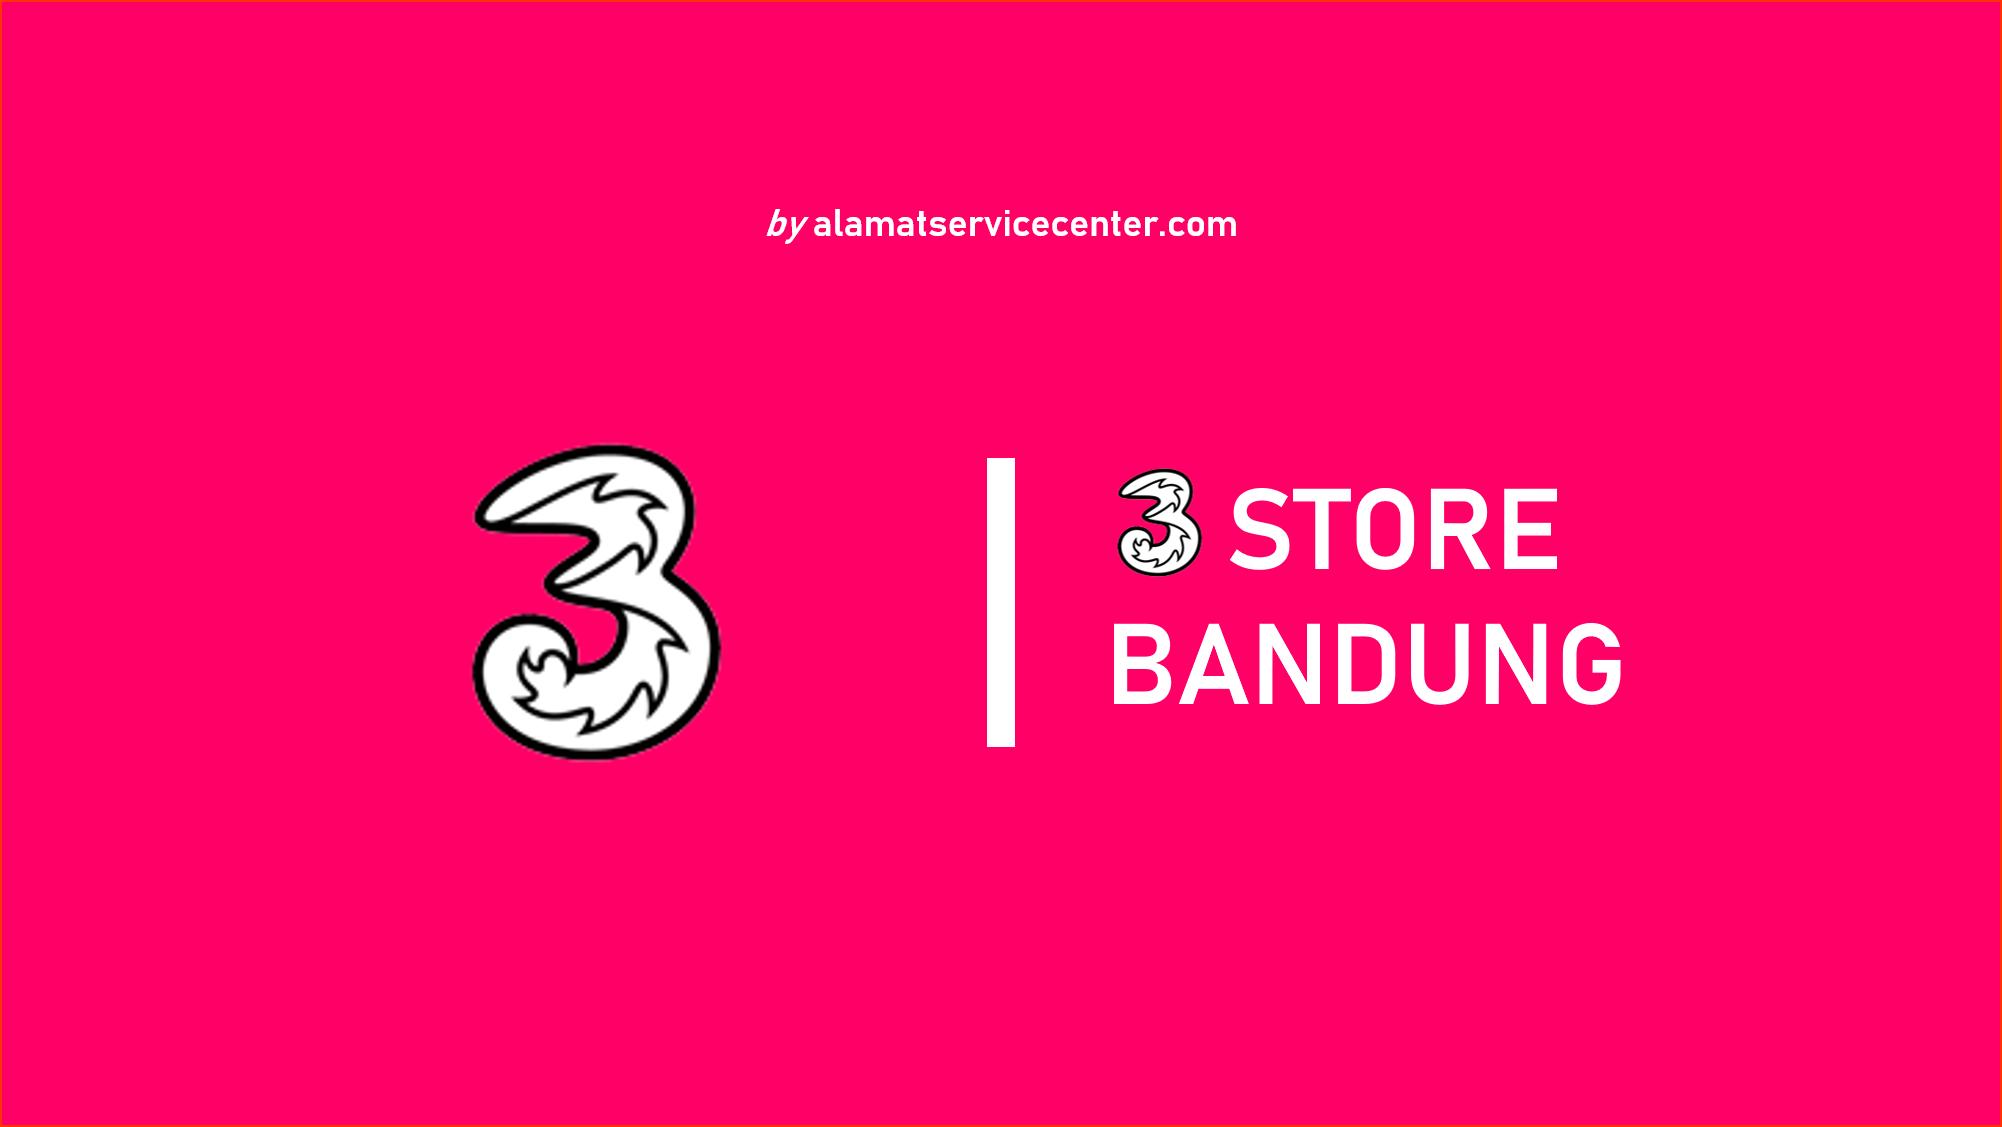 3 Store Bandung